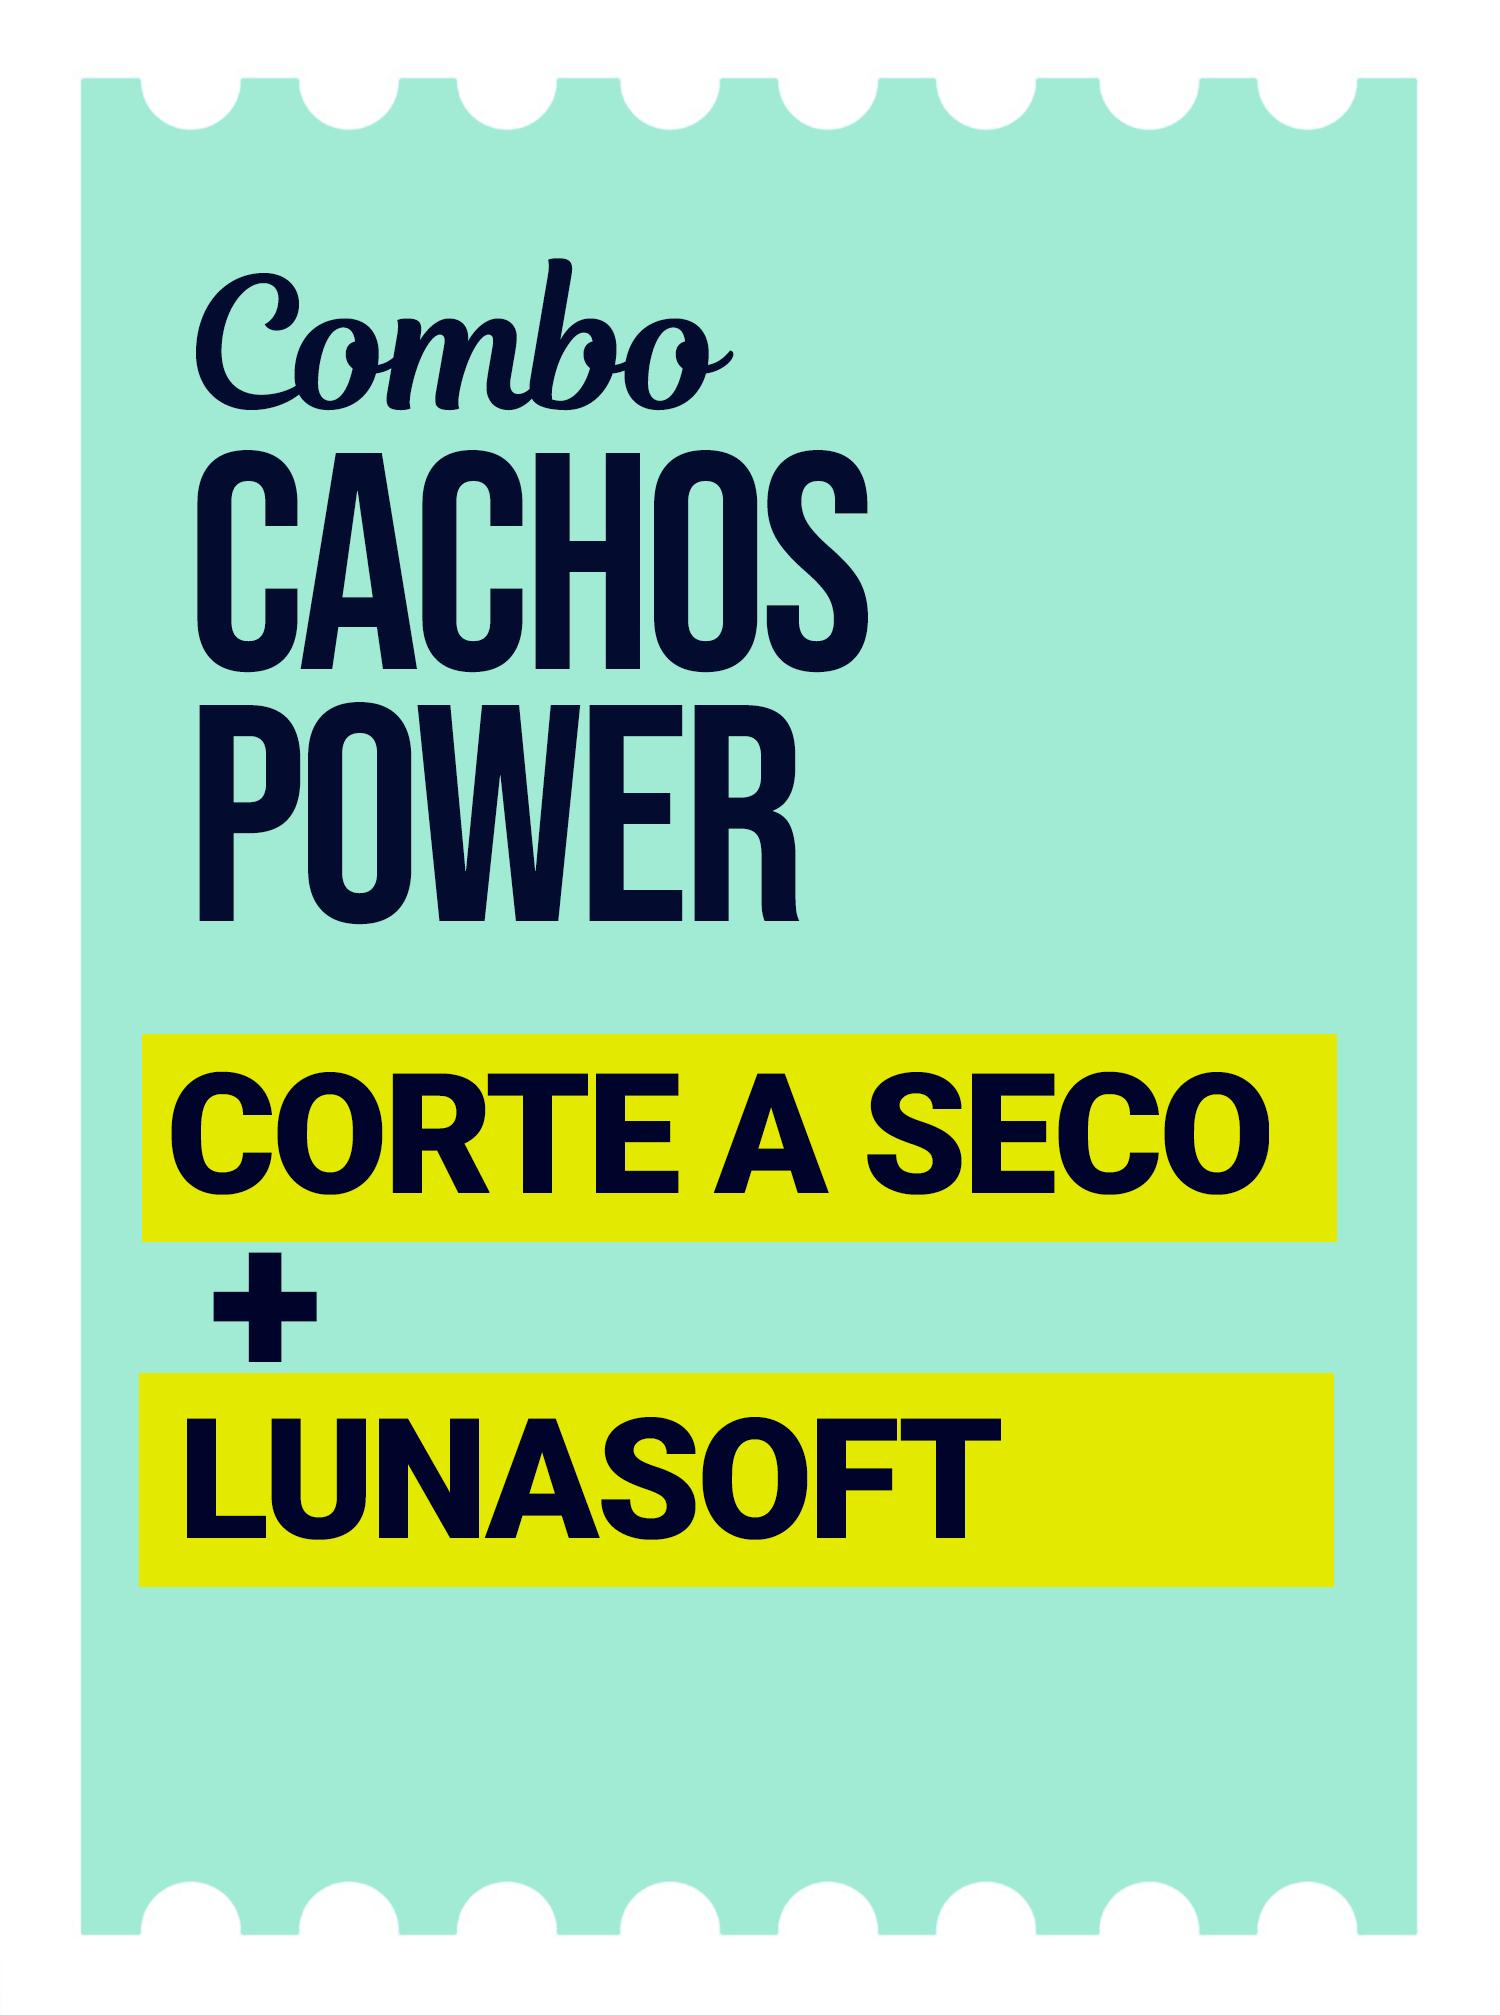 Combo Cachos Power!